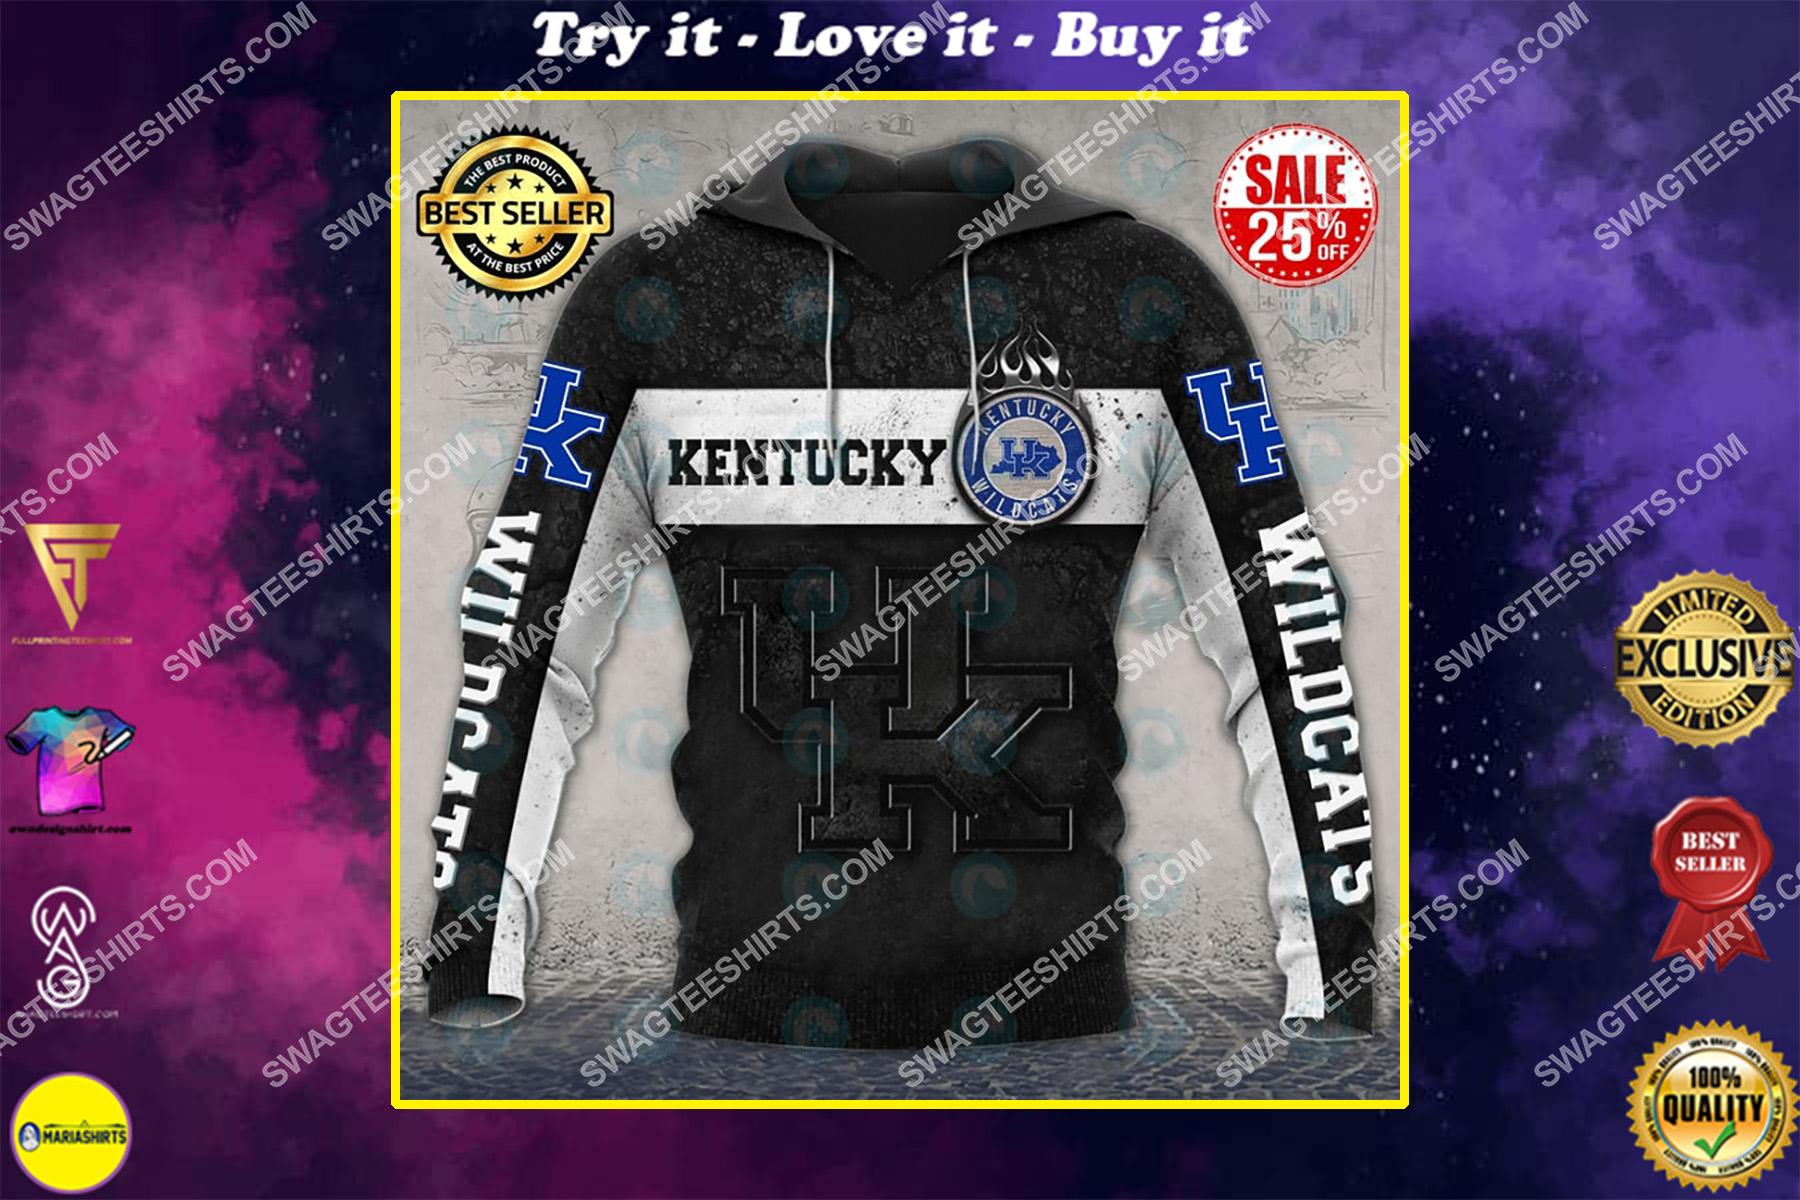 the kentucky wildcats football all over printed shirt